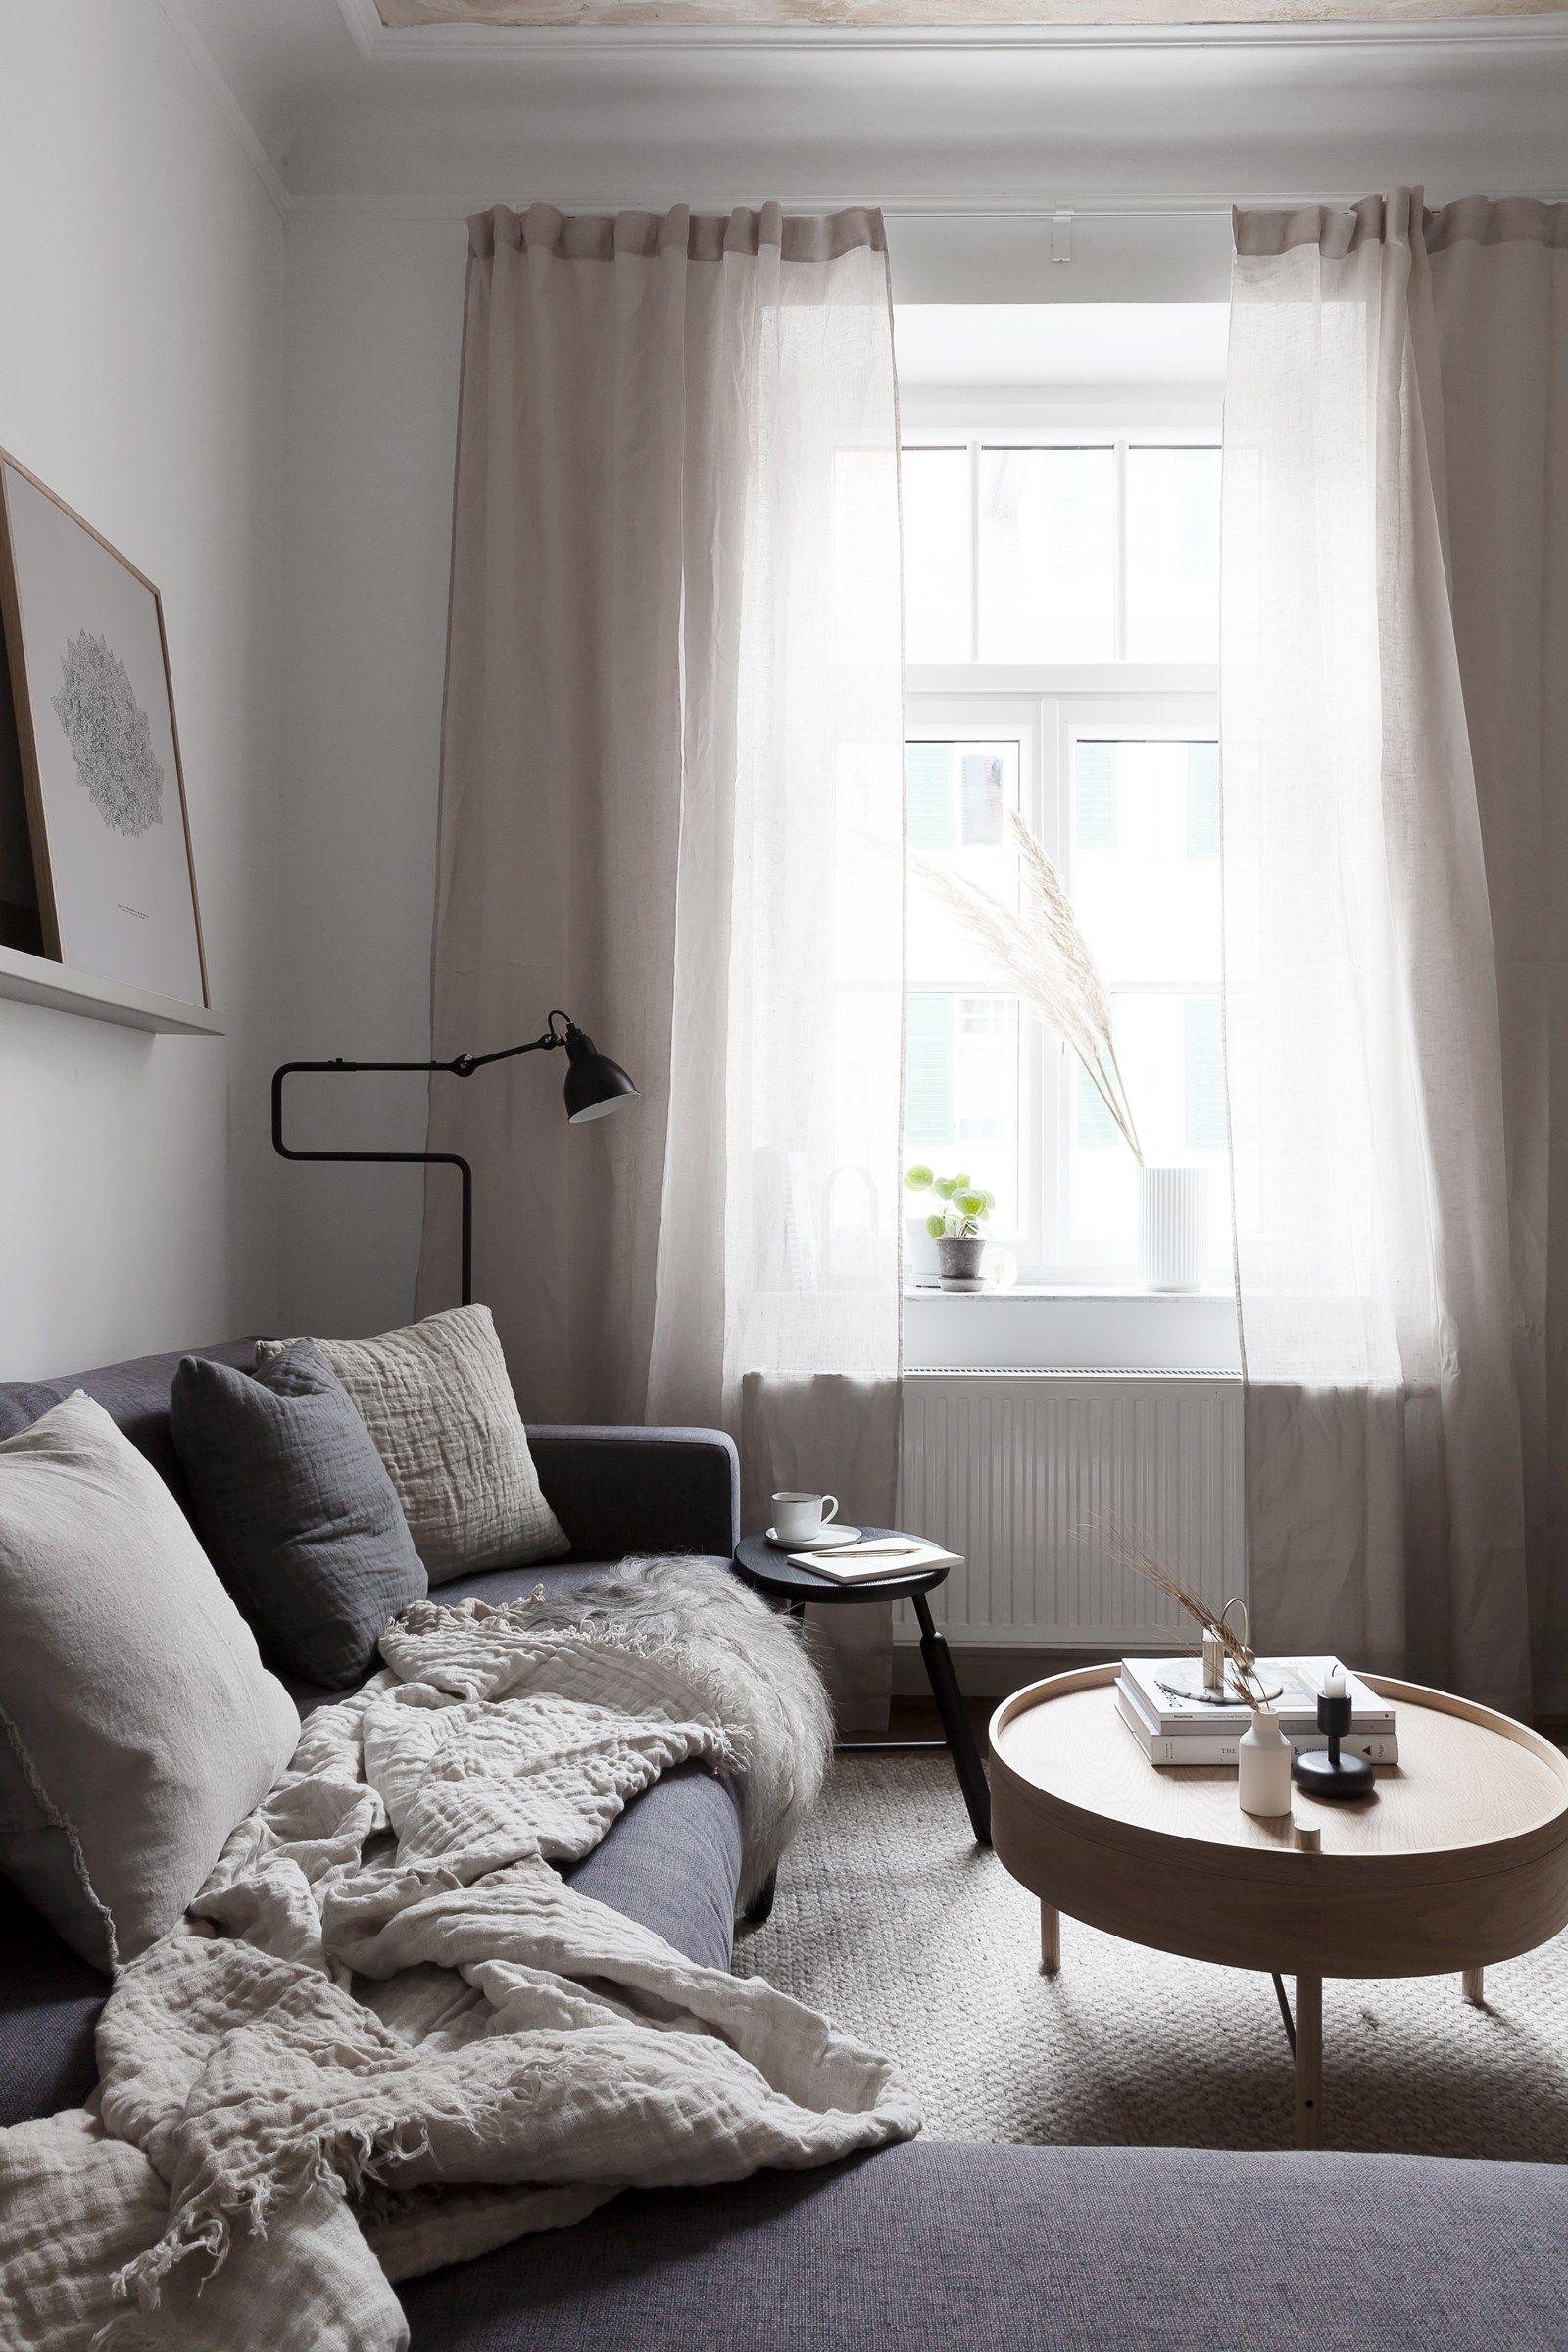 Beige in our living room | Haus | Pinterest | Beige, Living rooms ...